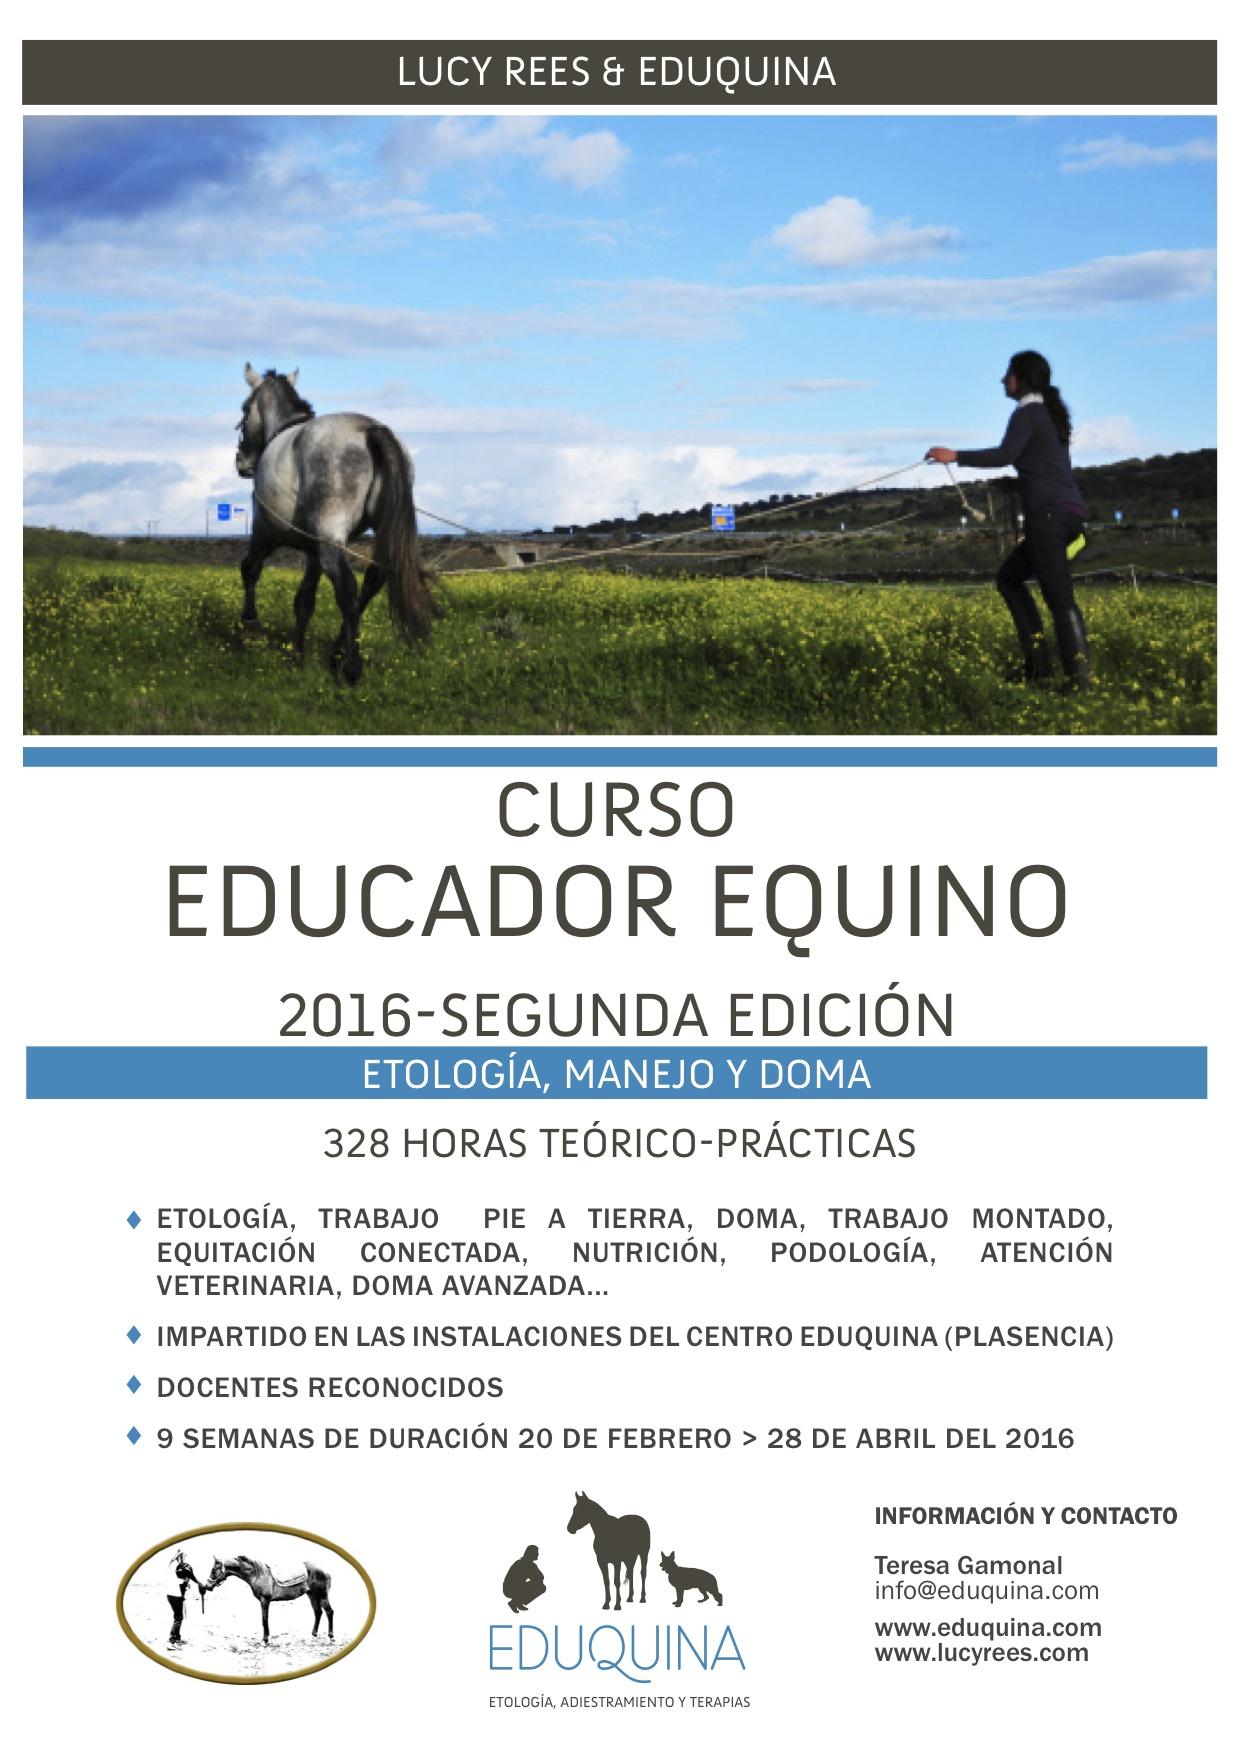 EDUCADOR EQUINO 2016